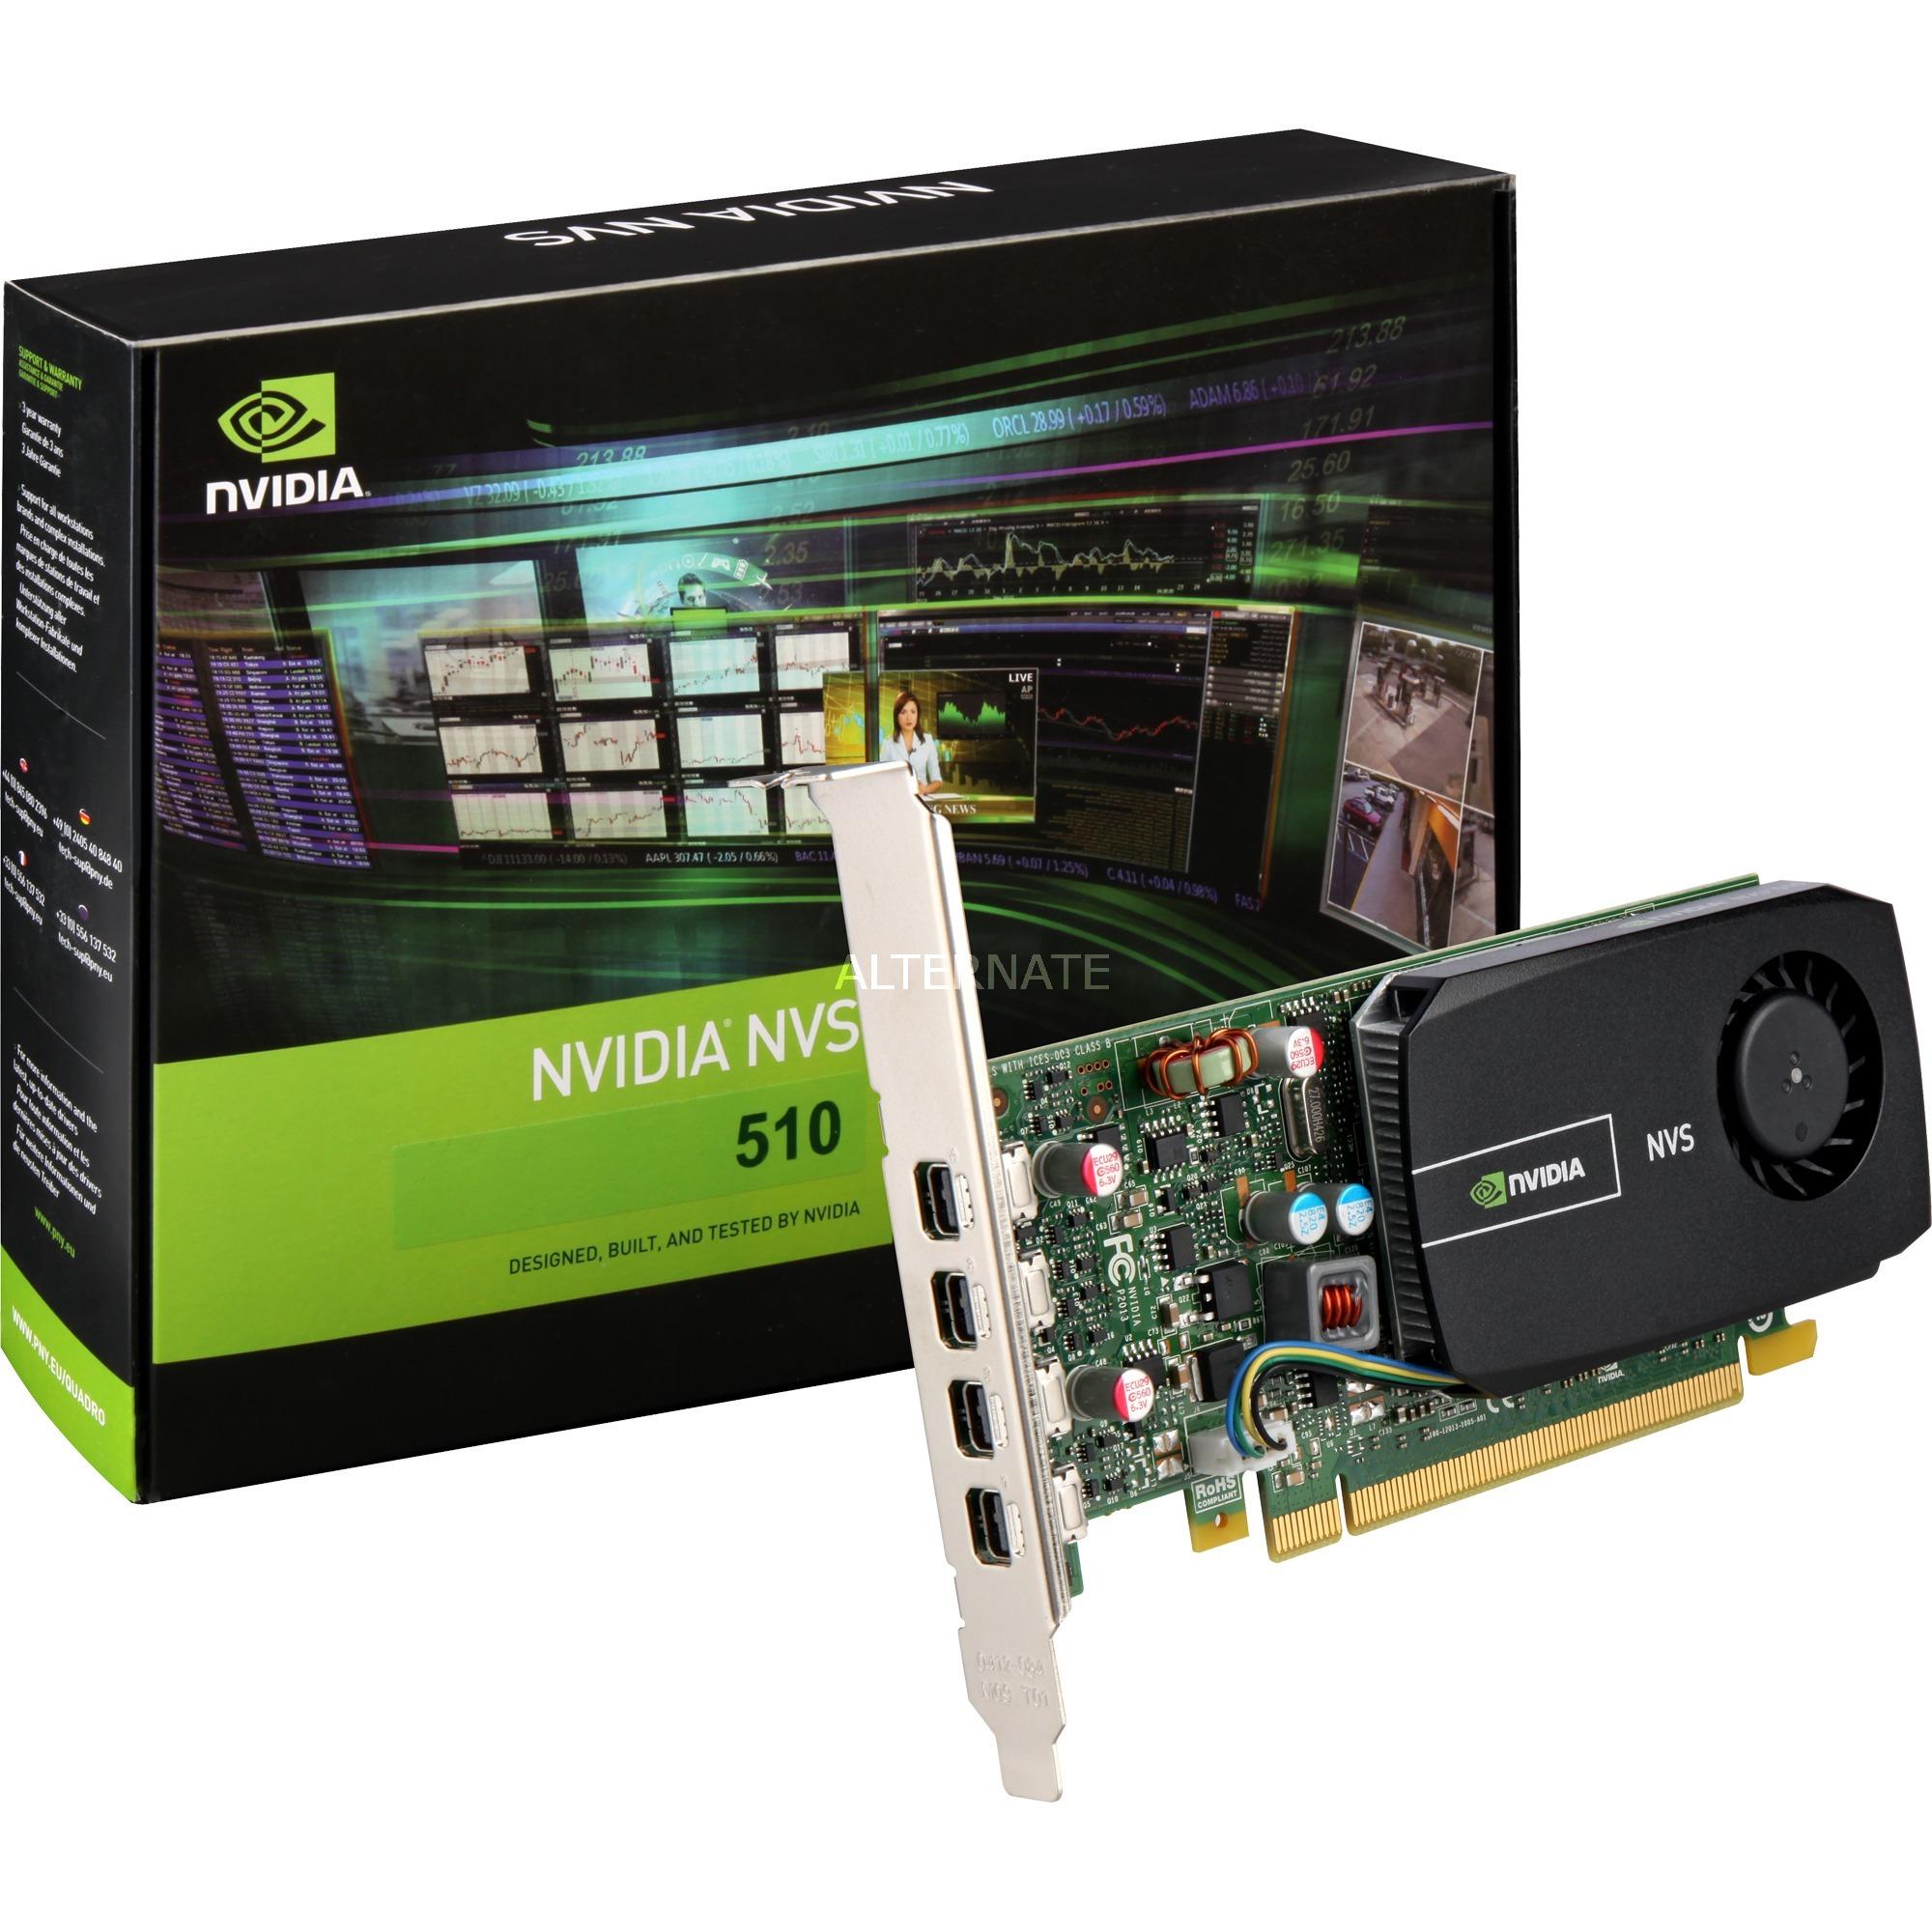 VCNVS510DP-PB NVS 510 2GB GDDR3 tarjeta gráfica